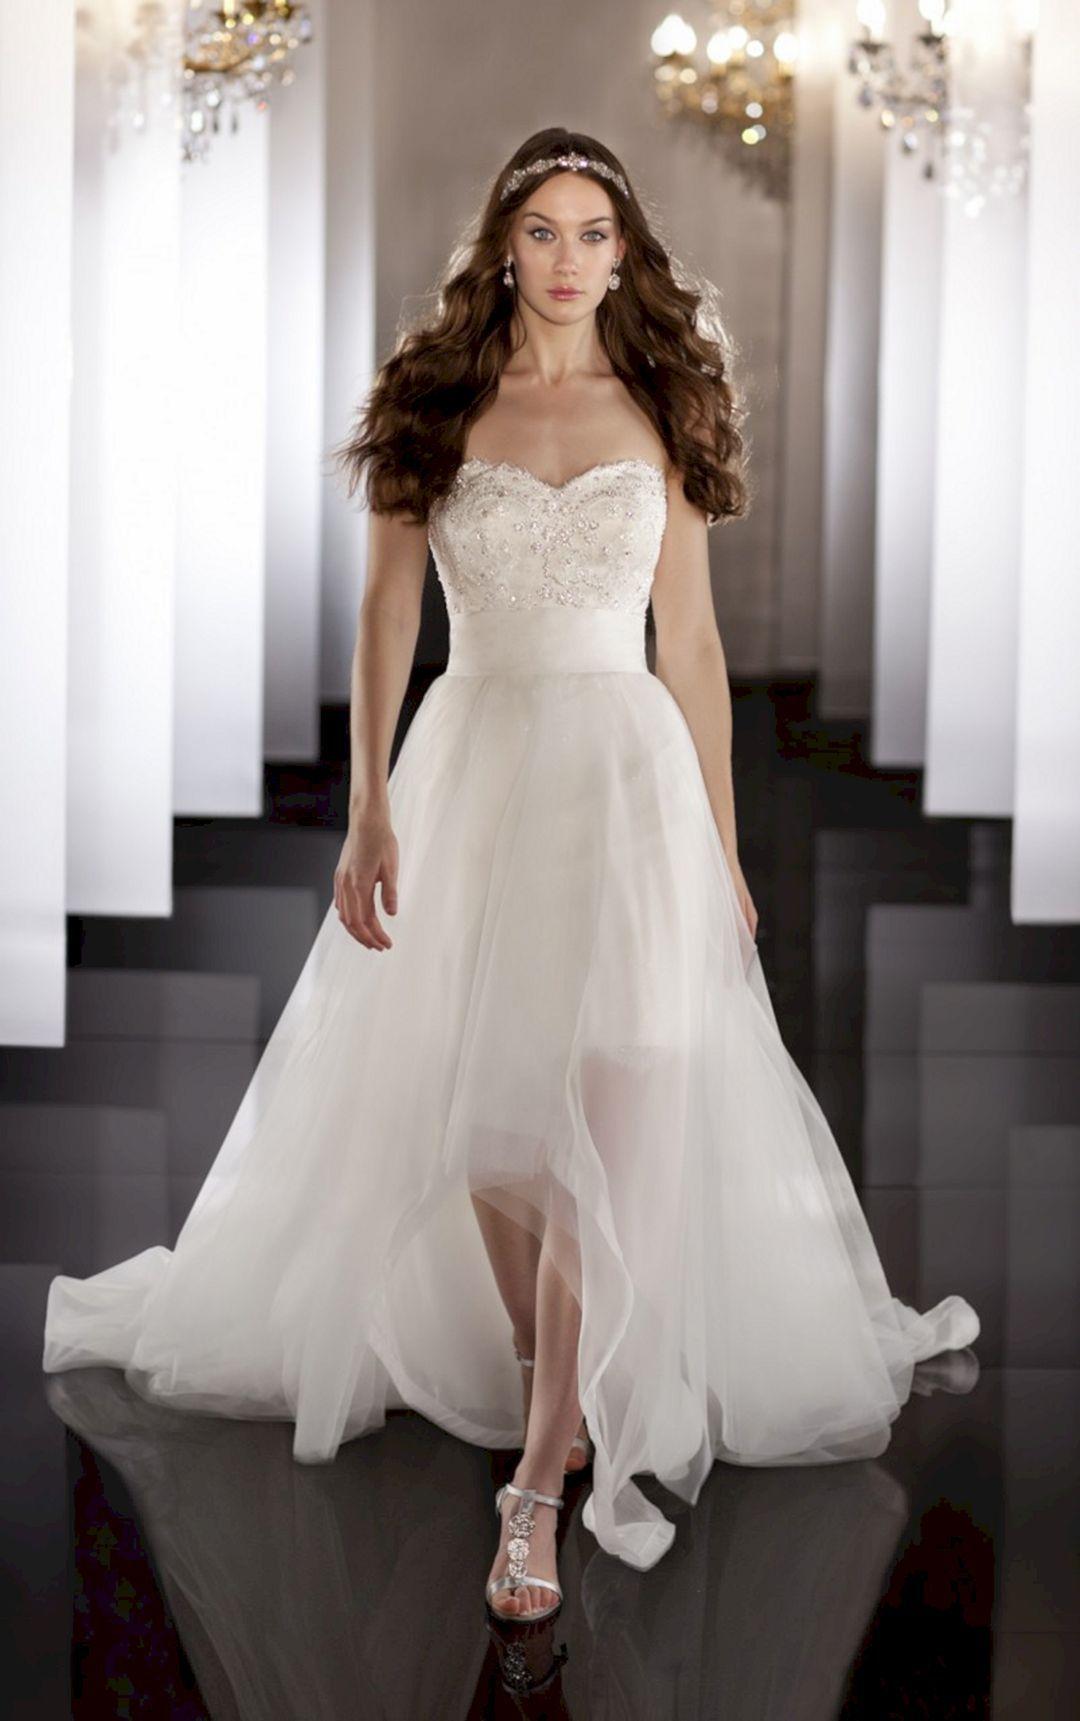 best and amazing bridesmaid dress design ideas bridesmaid